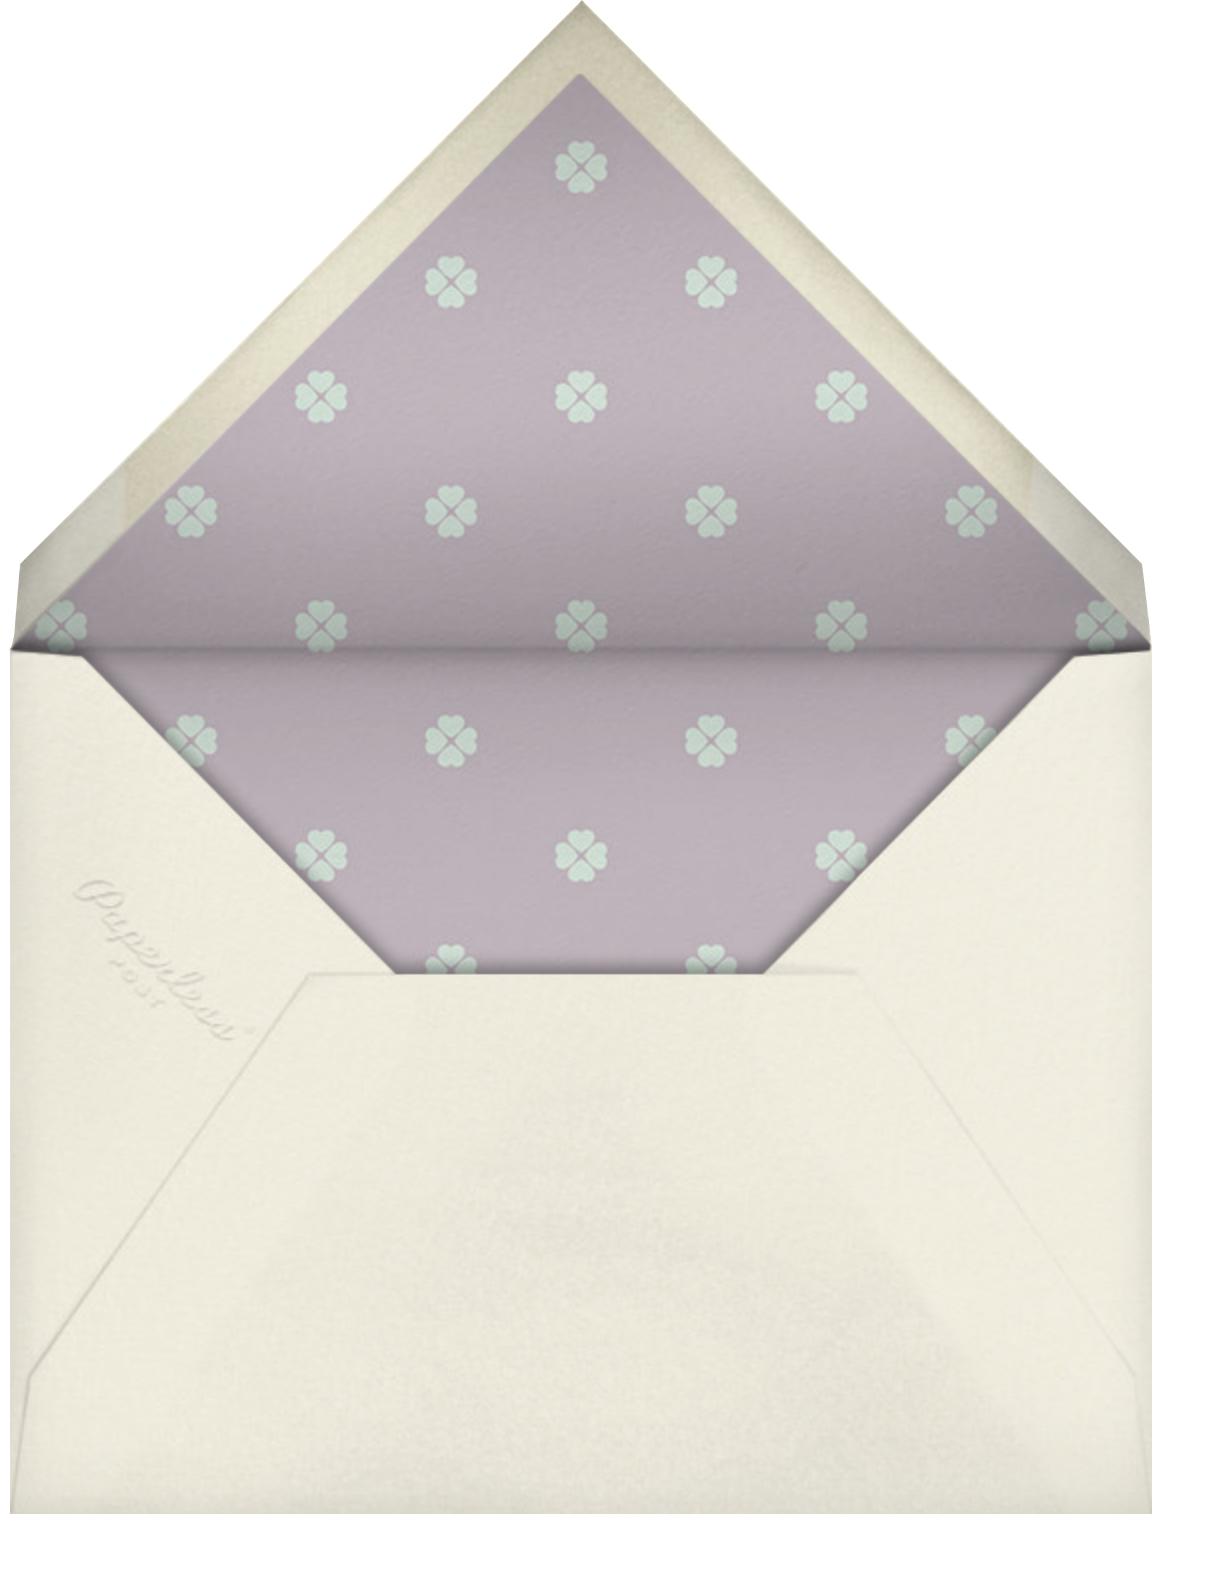 Flower Patch - Antique Pink - kate spade new york - Adult birthday - envelope back